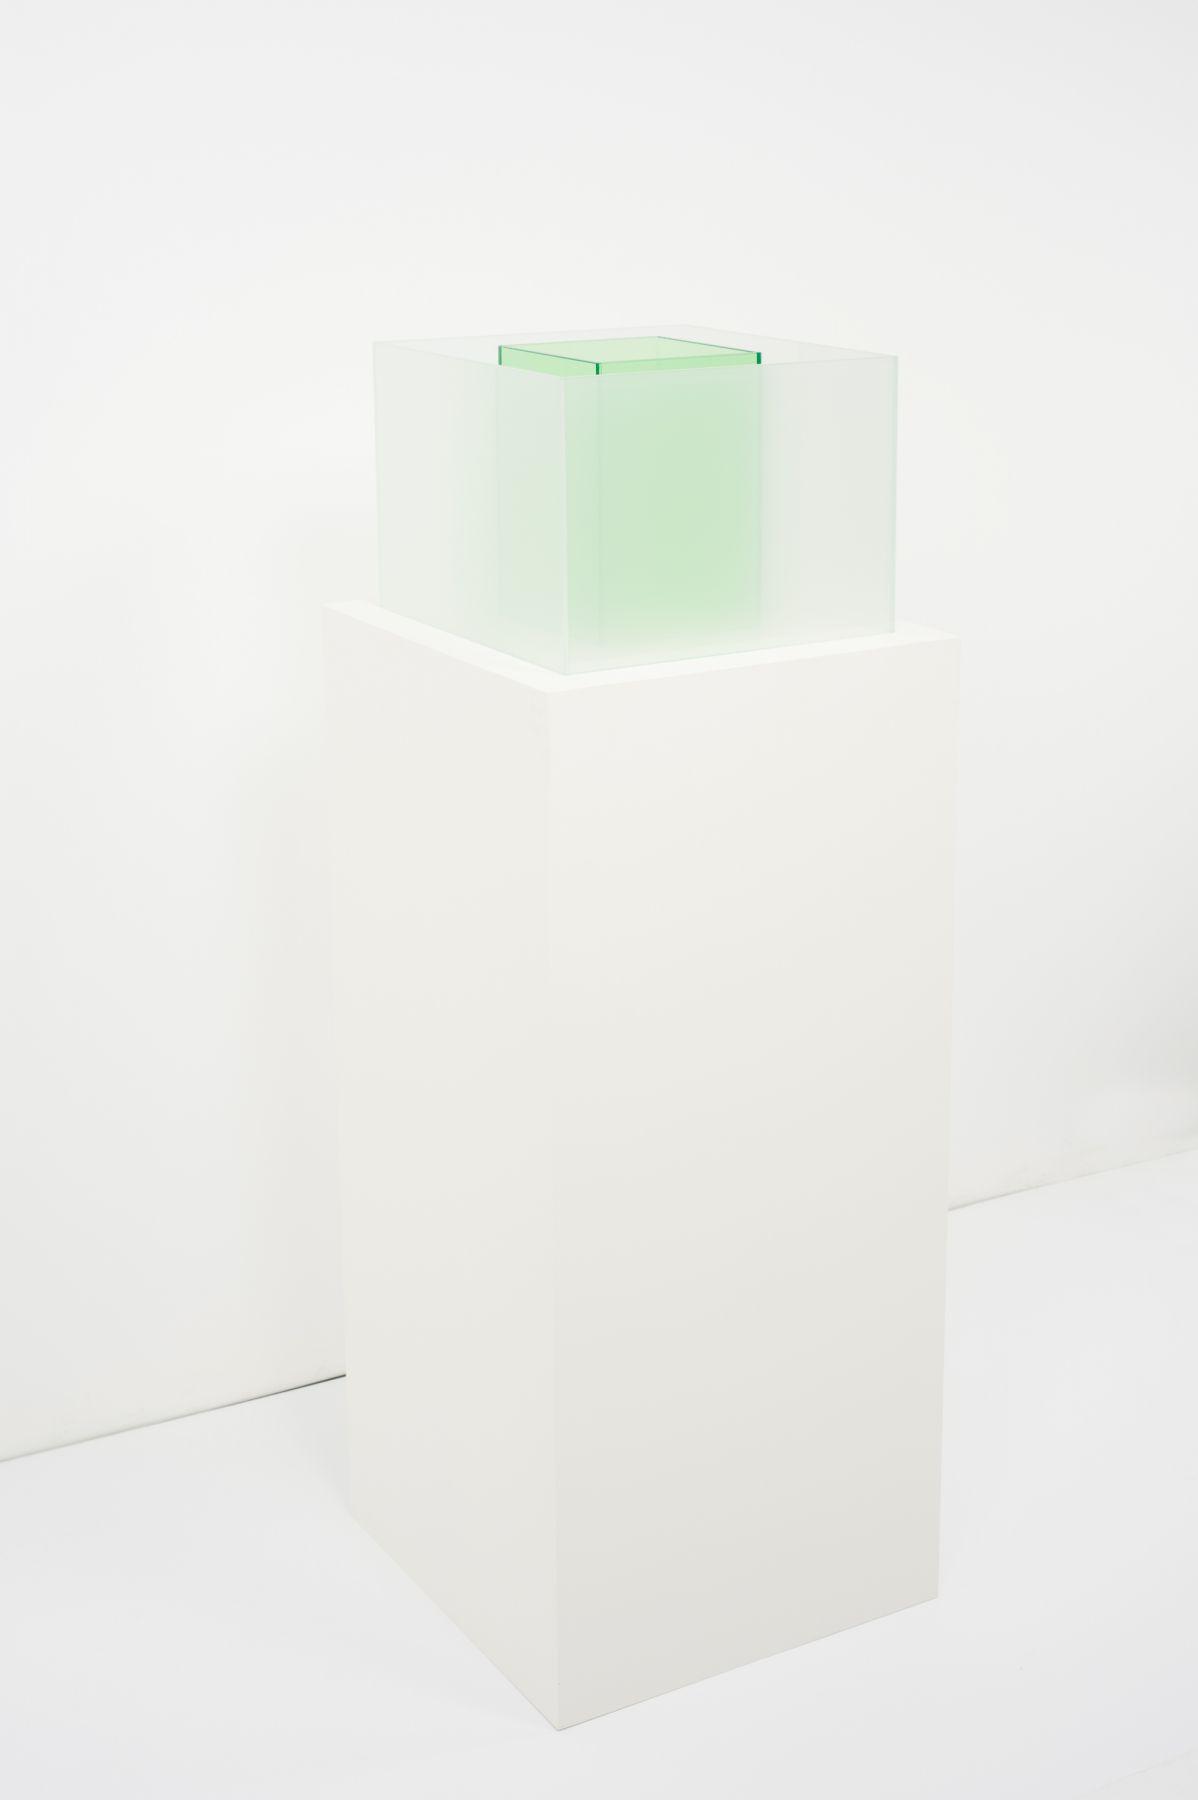 Larry Bell, Untitled Maquette (True Sea Salt / Kelp), 2018, Laminated glass